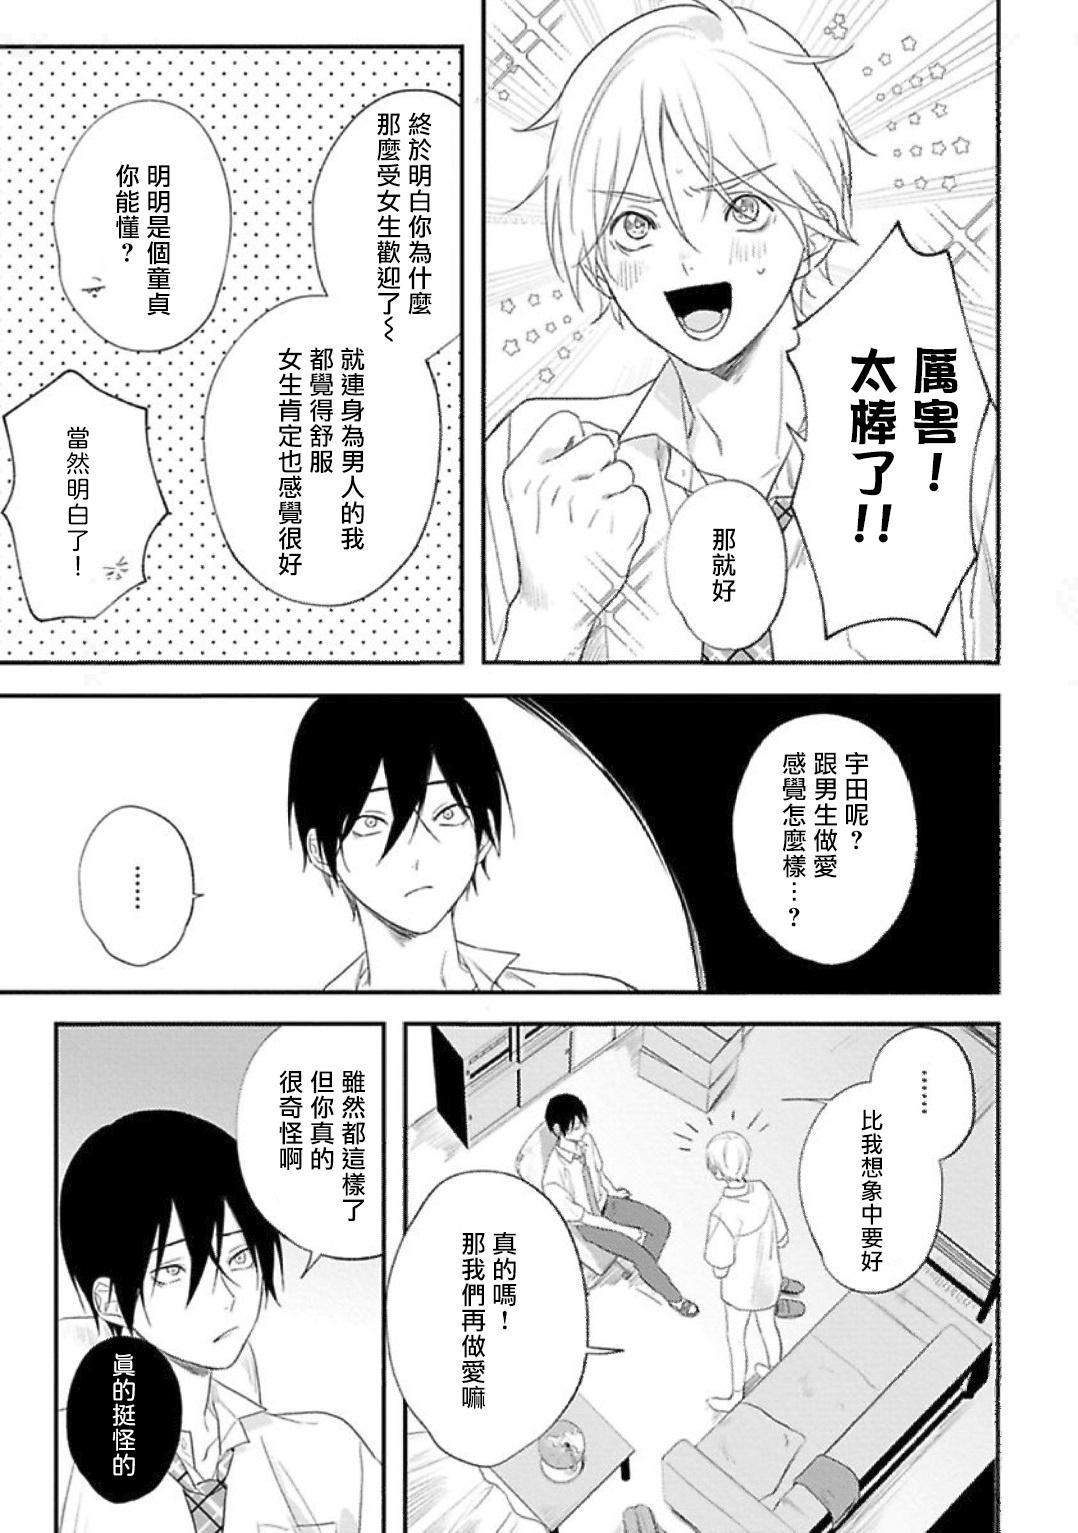 [Utata Hakuto] Houkago Virginity - Virginity afterschool 1-3 [Chinese] [拾荒者汉化组] [Digital] 32